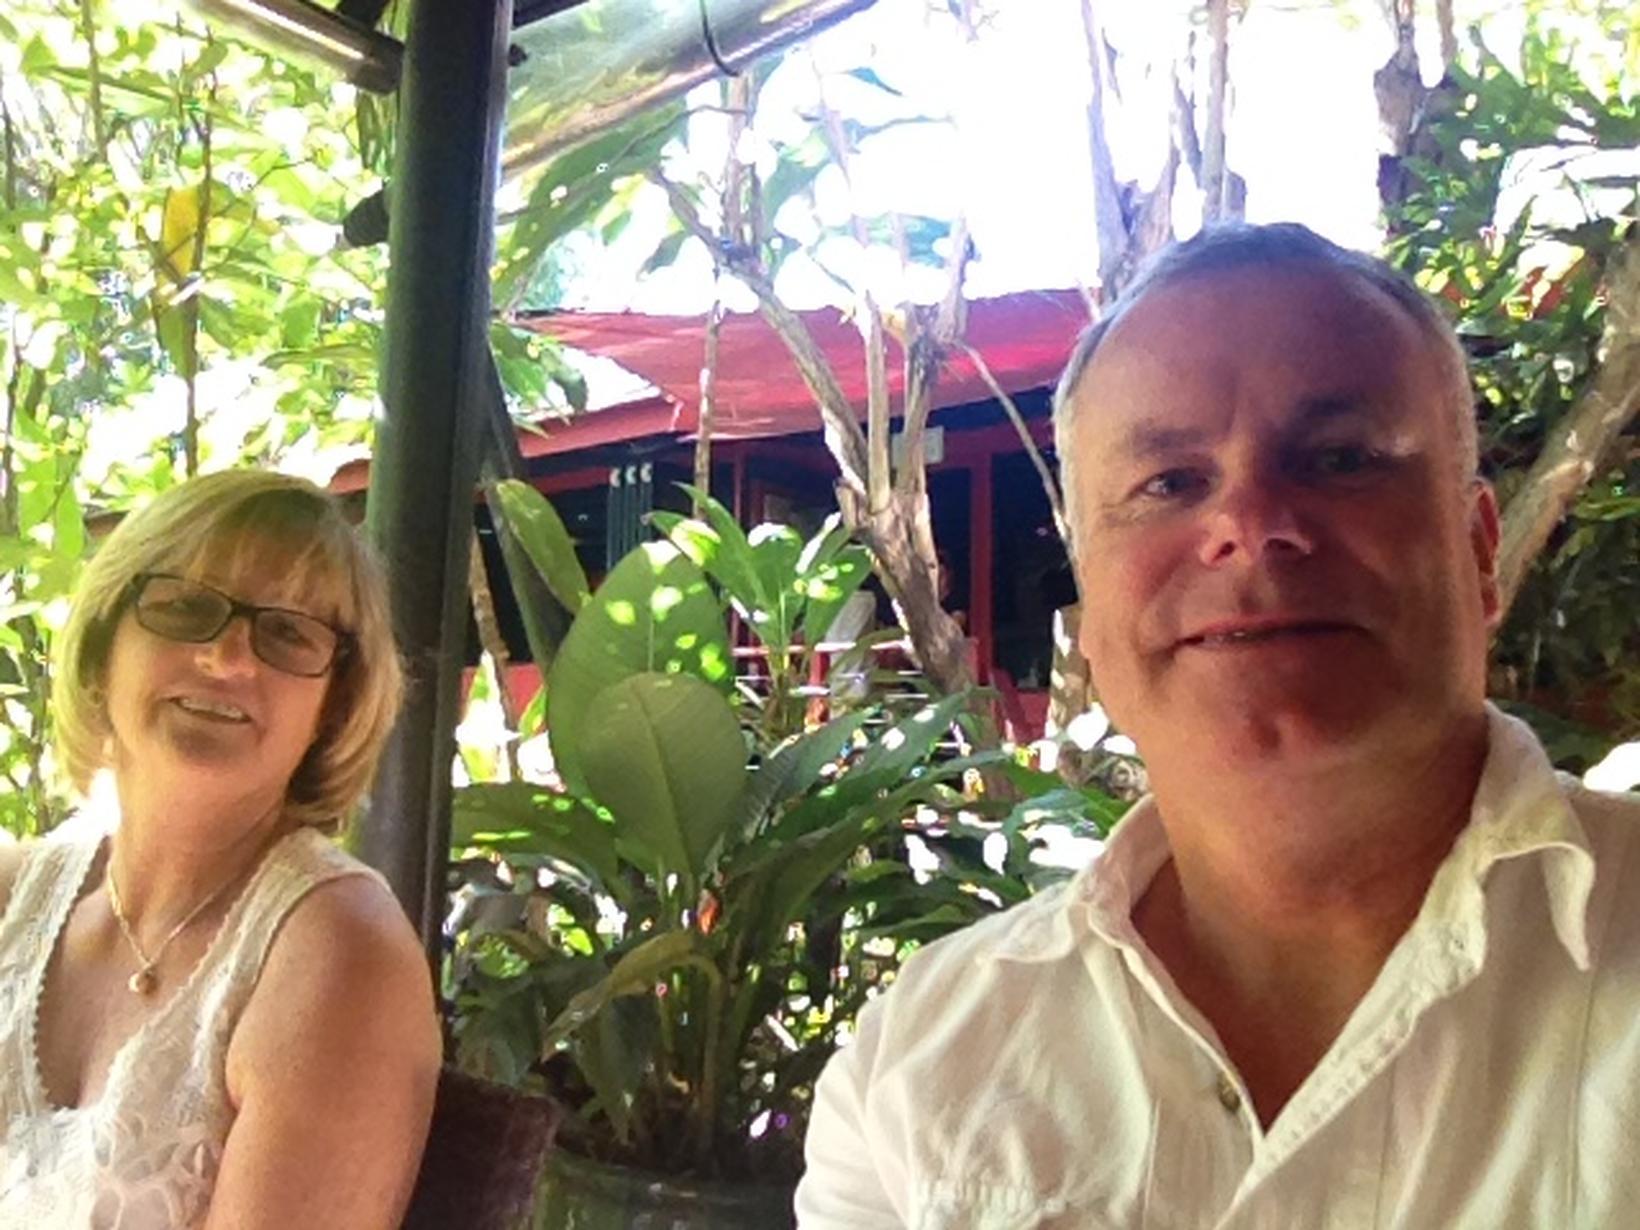 Charles & Angela from Melbourne, Victoria, Australia